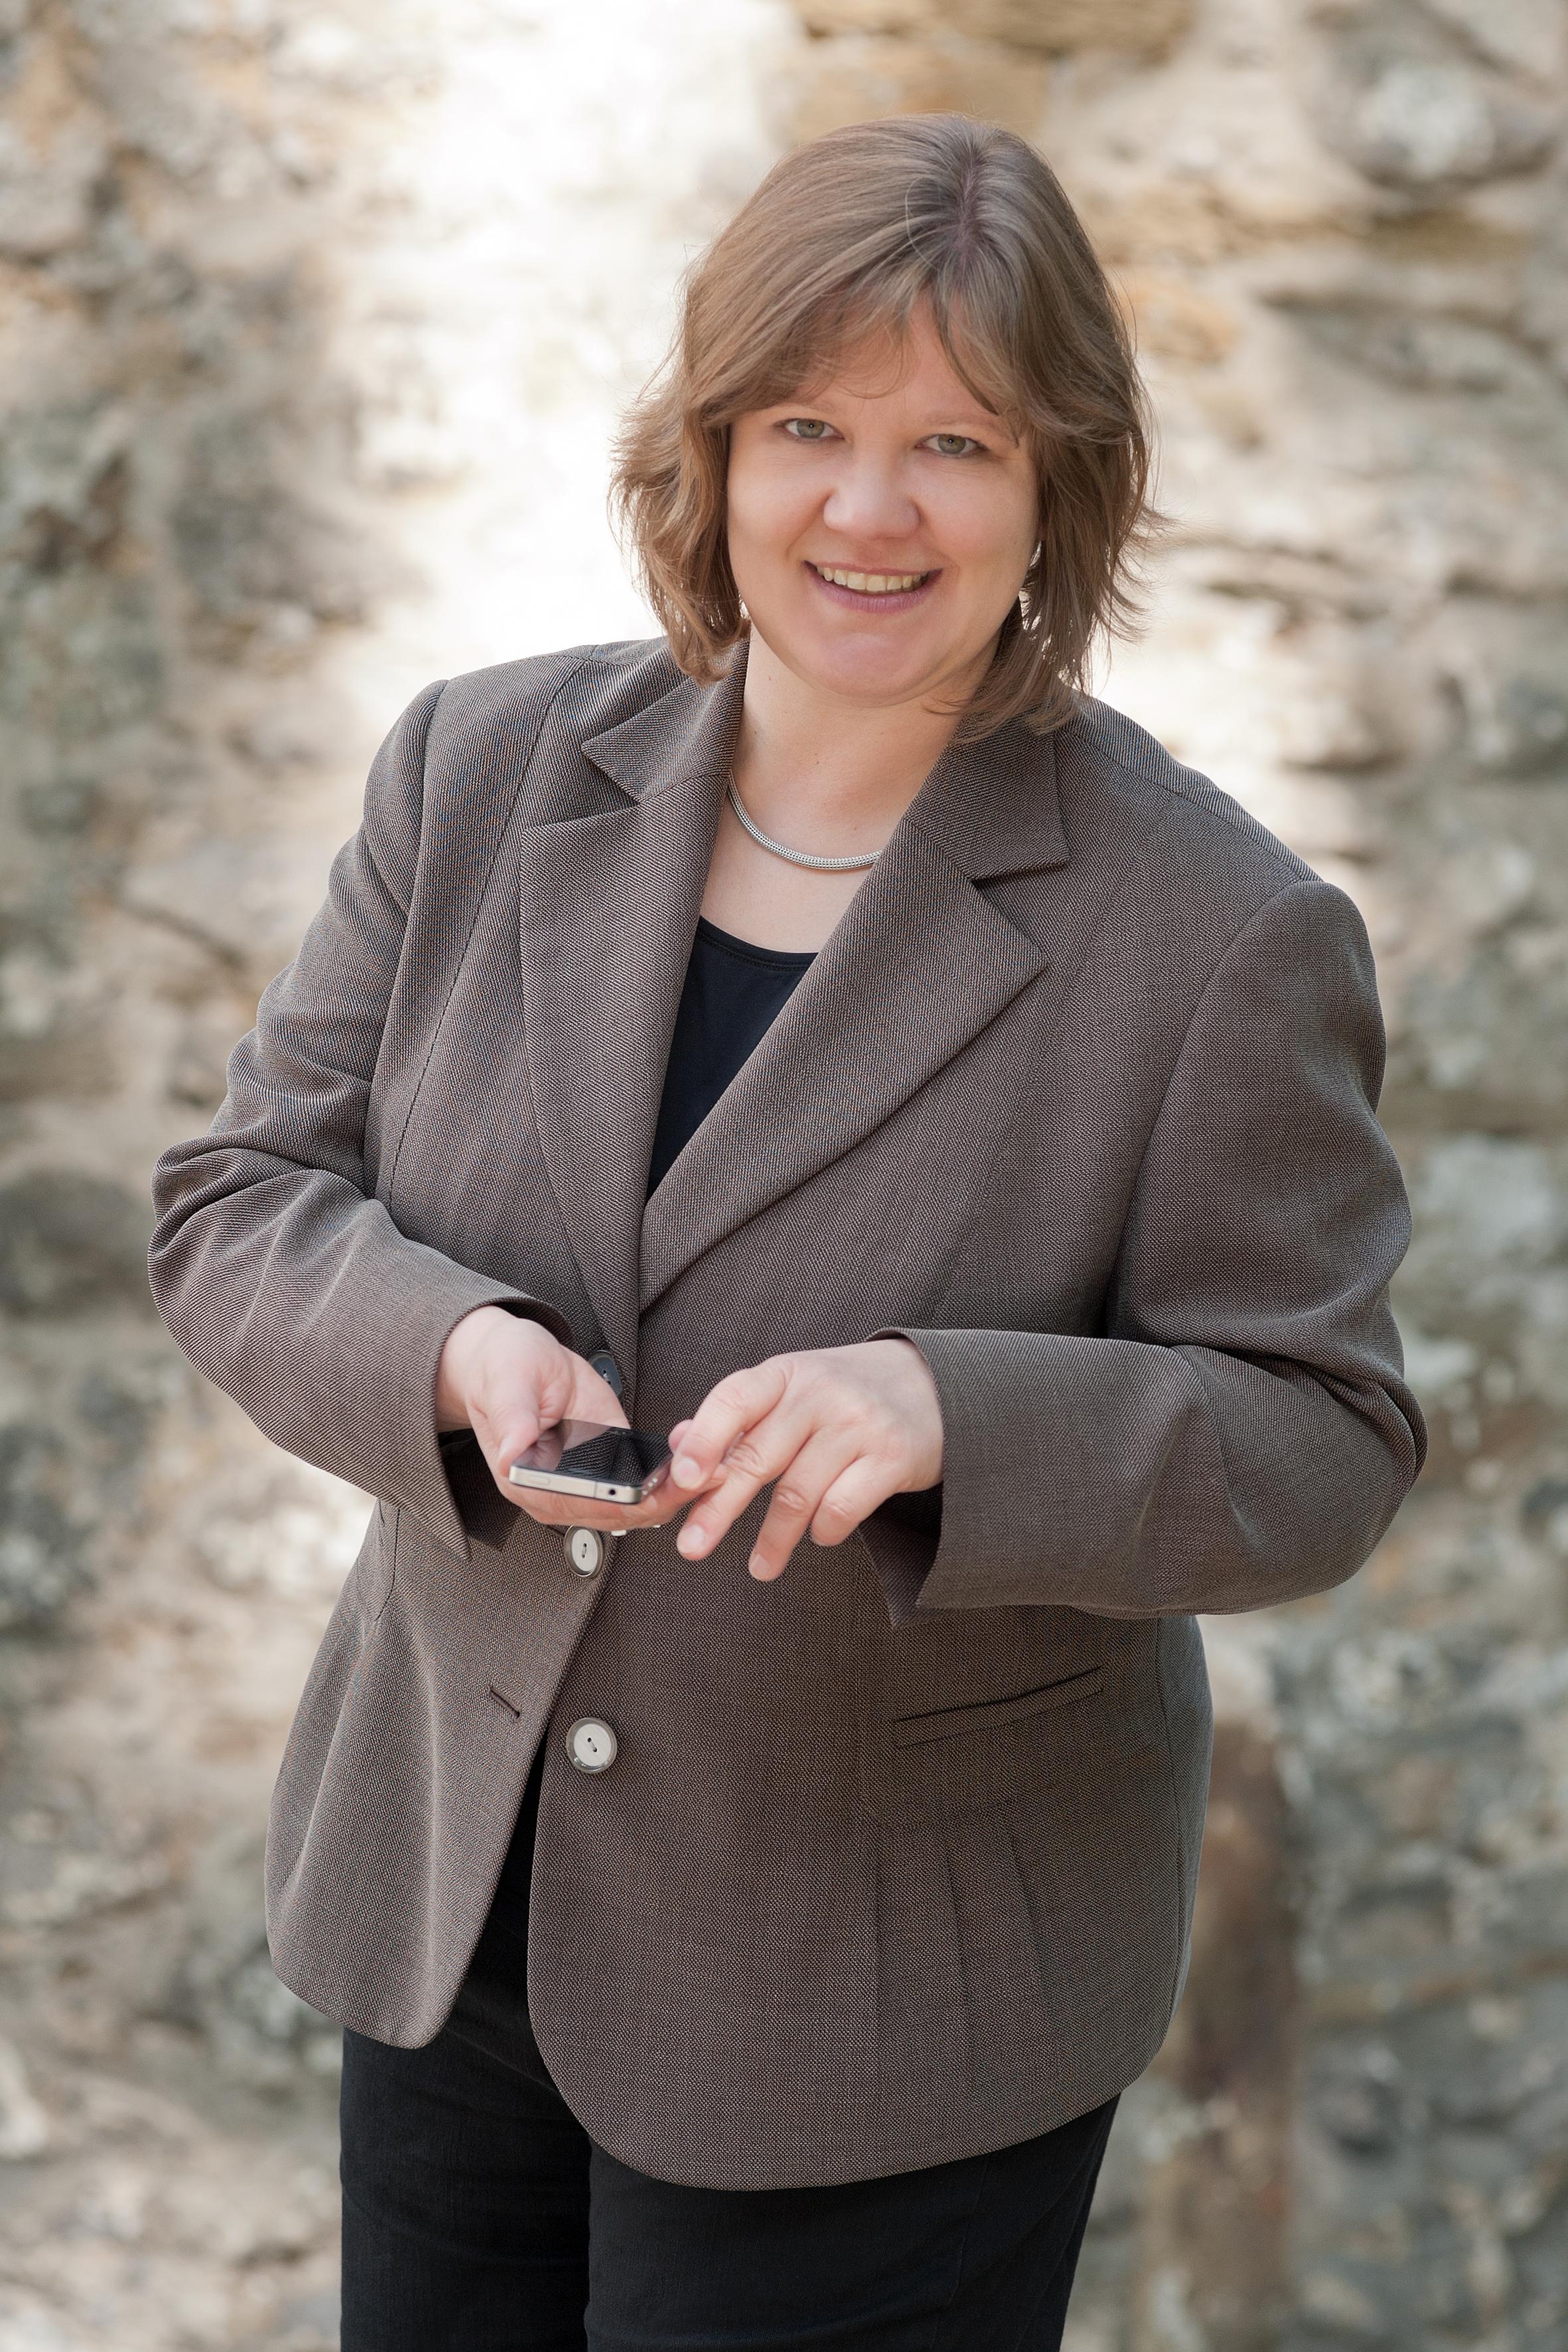 Meike Nordmeyer